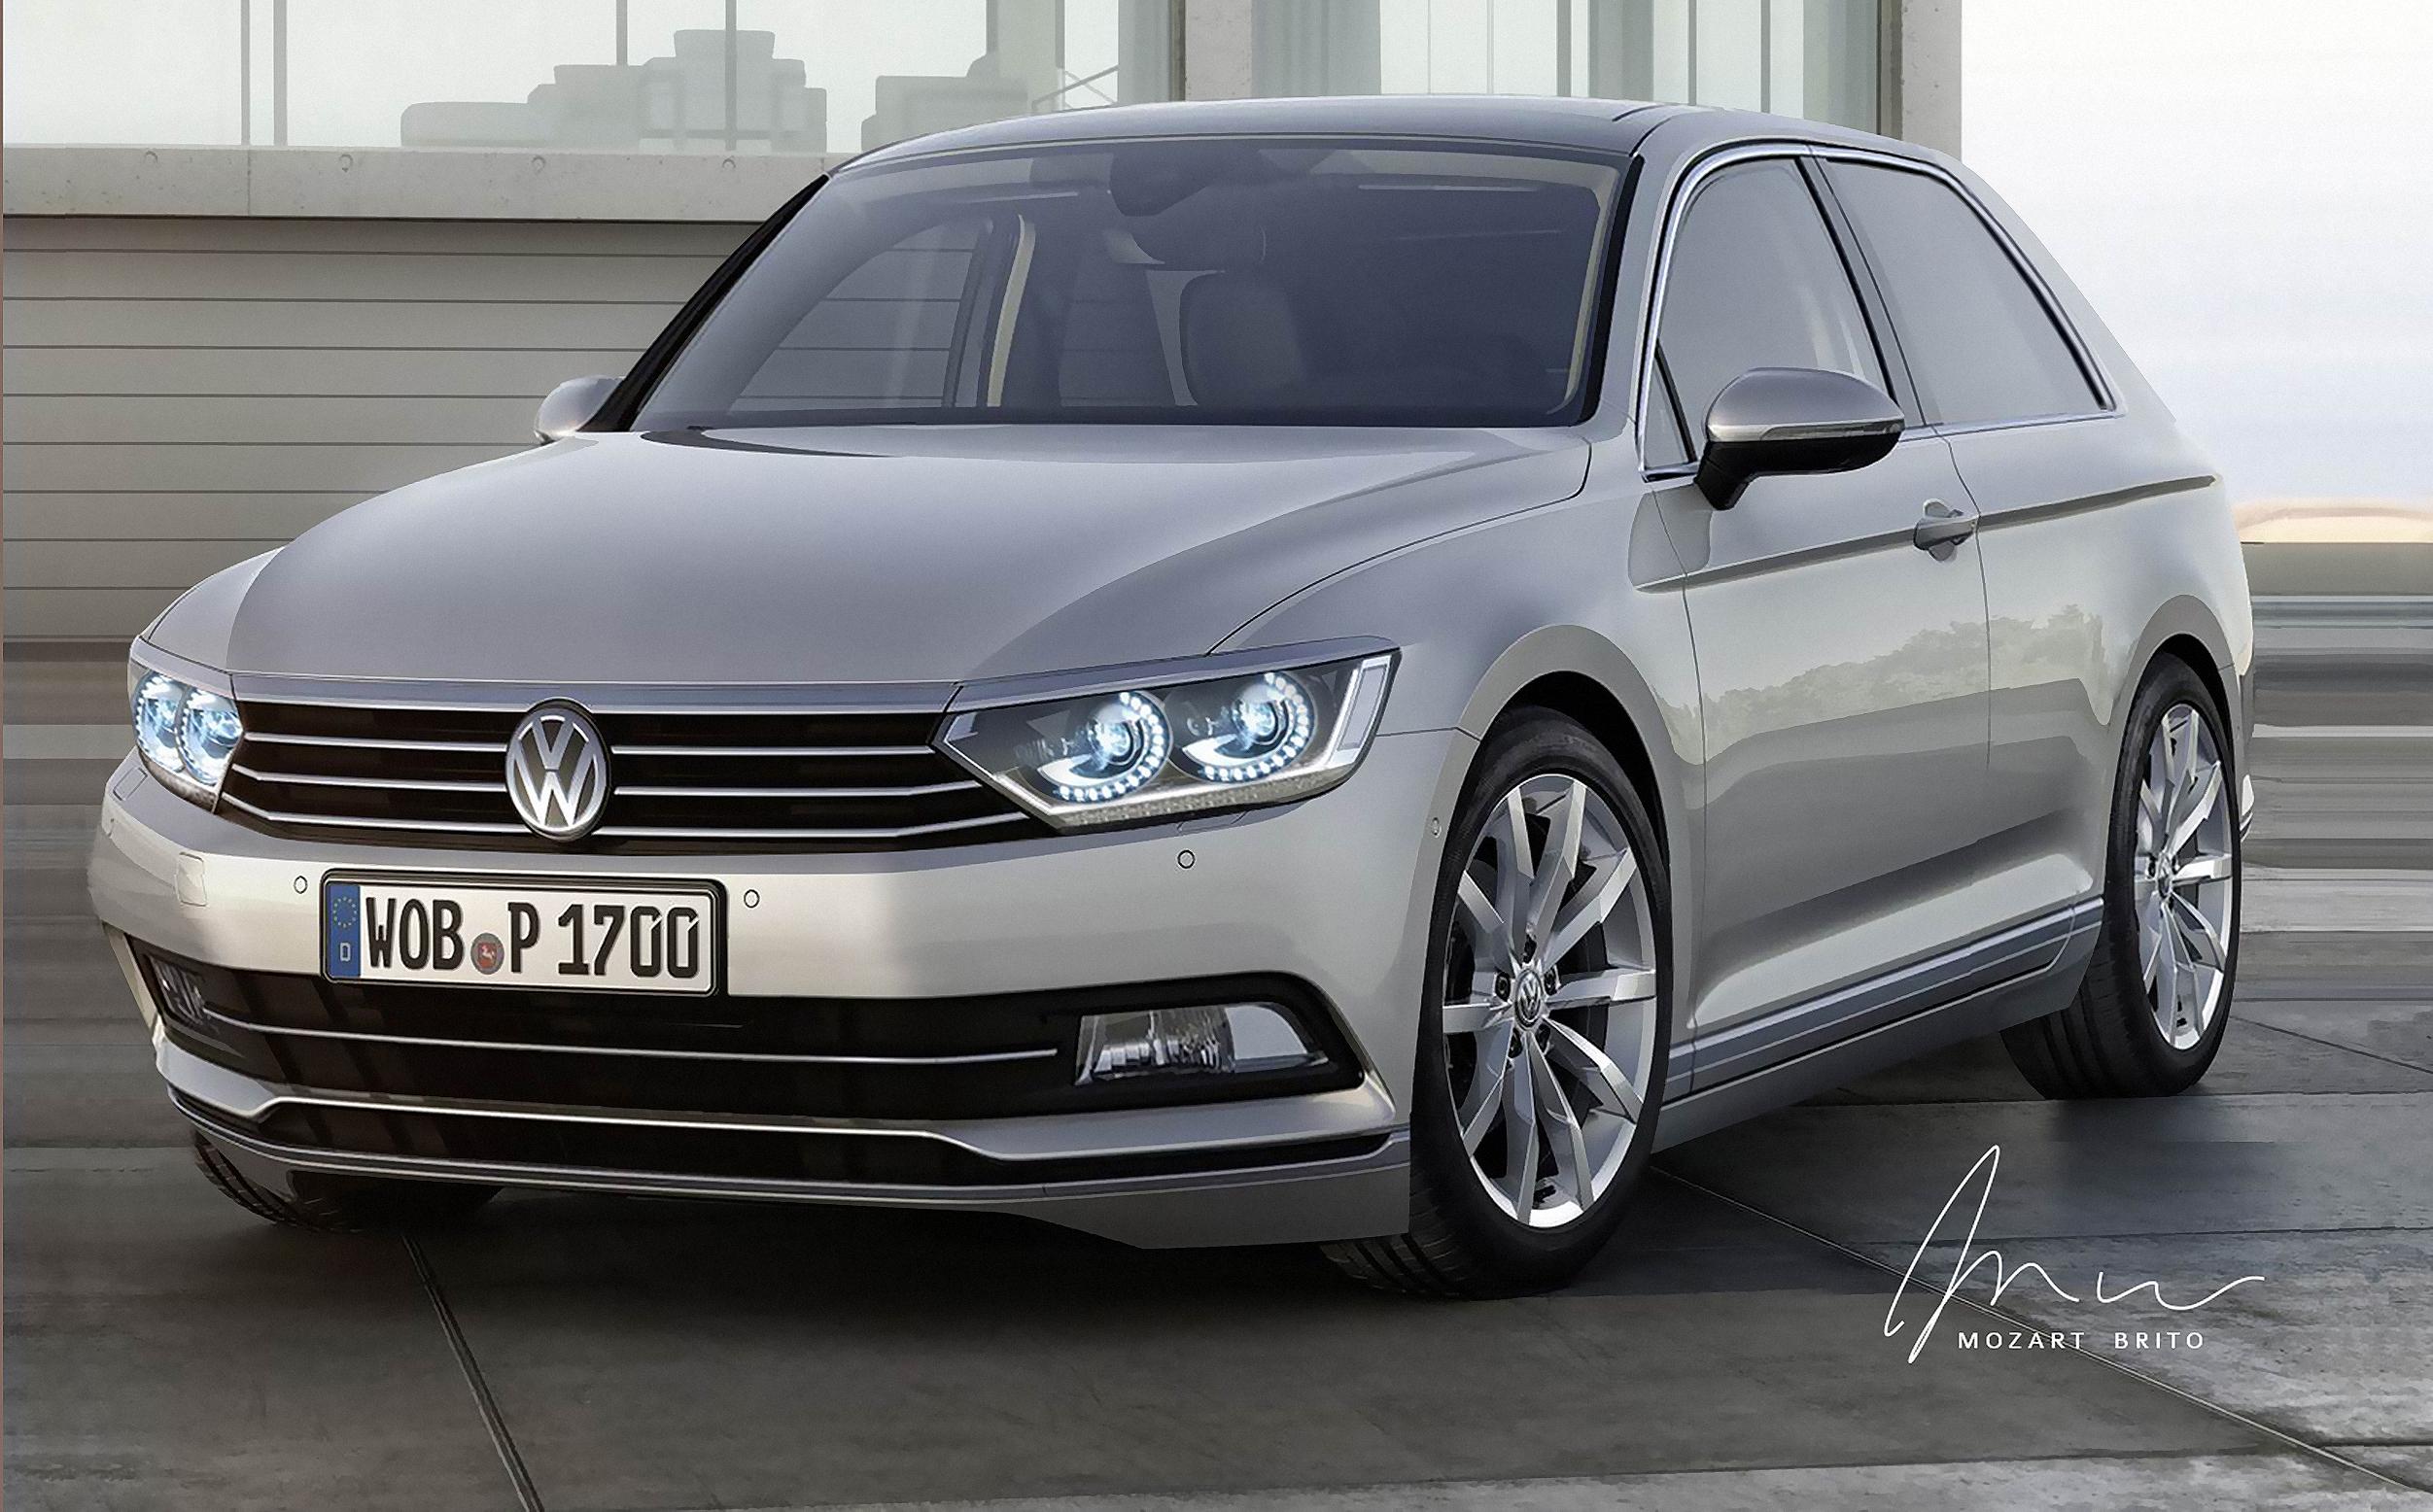 VW Brasilia - Mozart Brito